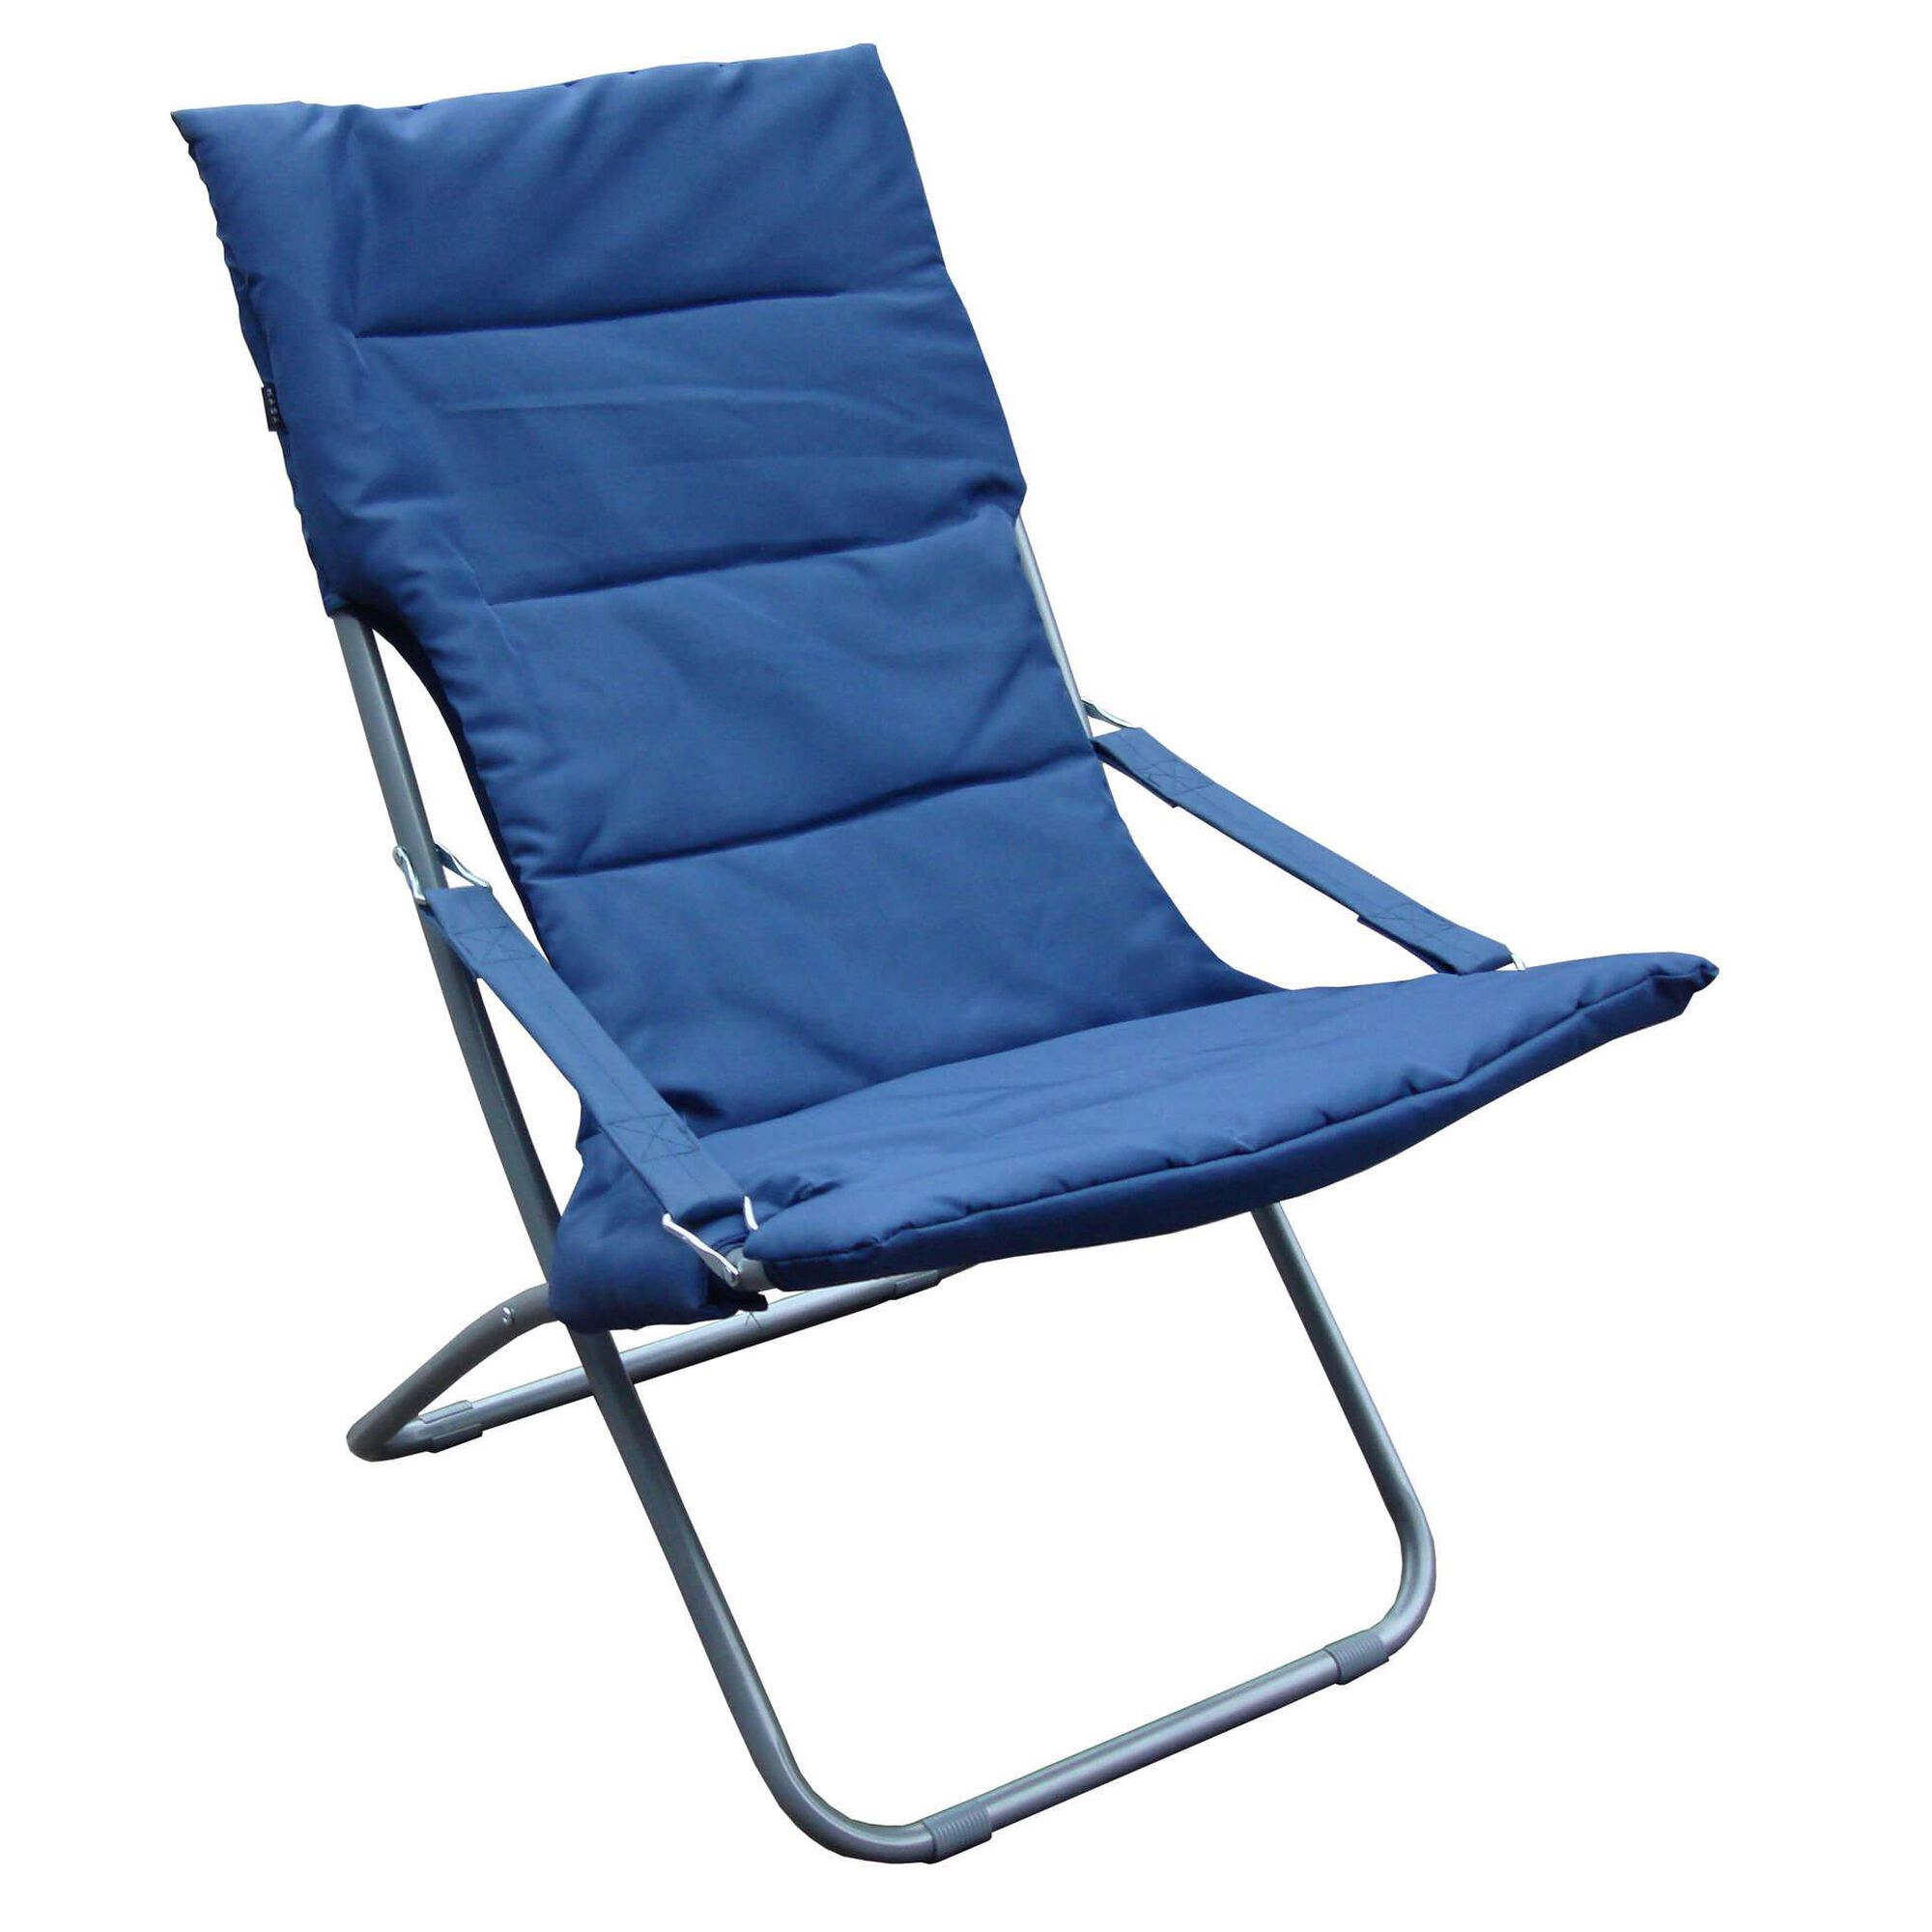 Cadeira Acolchoada Habana Malibu